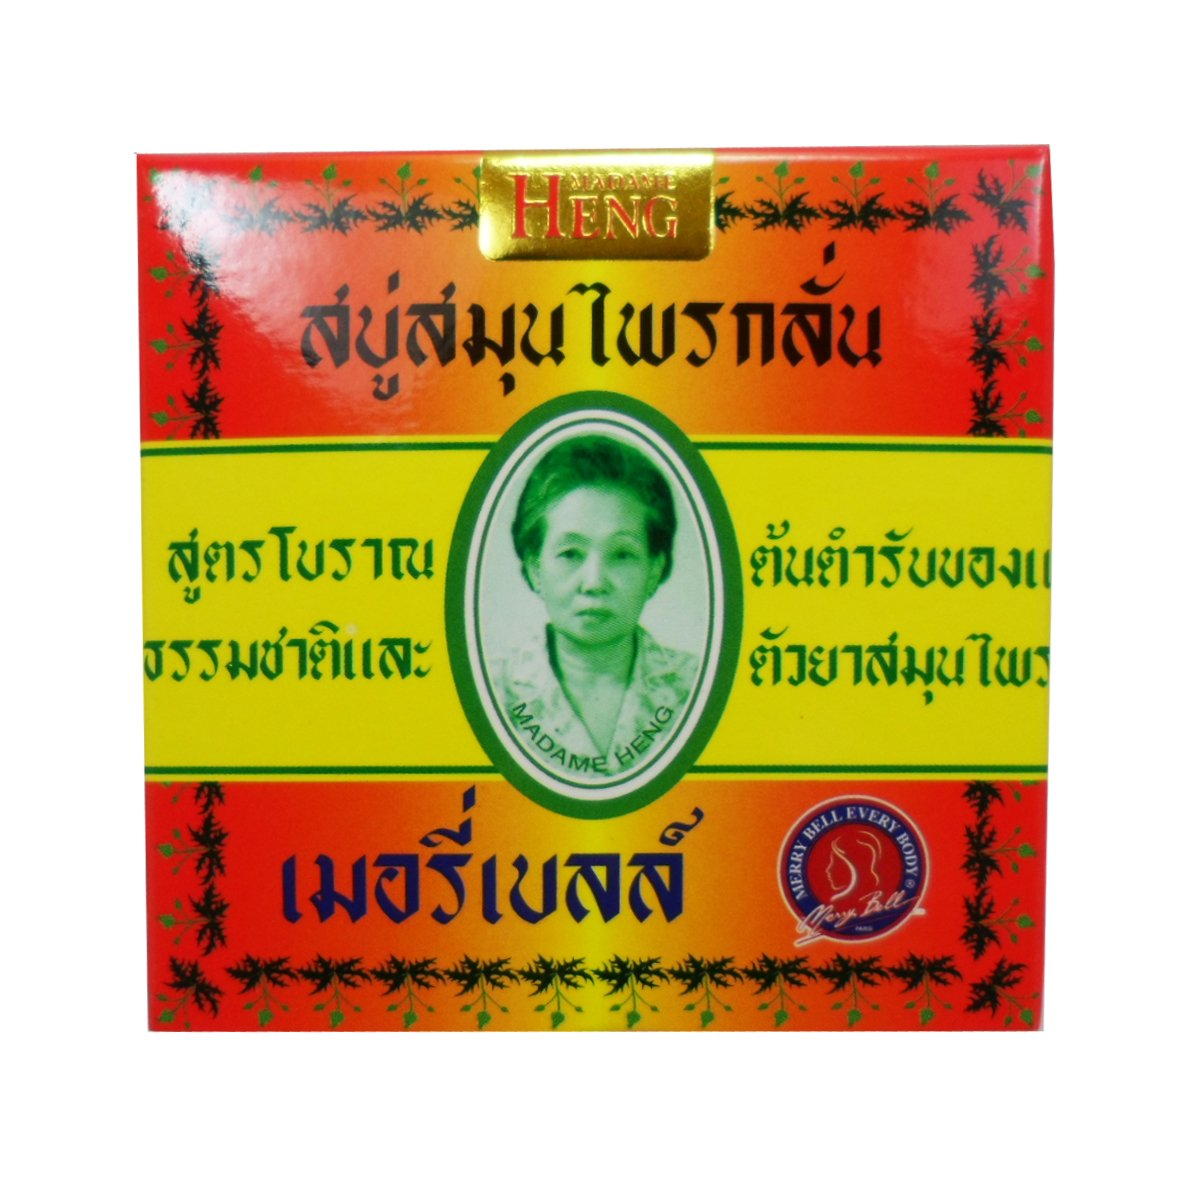 Madam Heng Merry Bell Herbal Soap 160g (5.64 Oz) Natural Original Formula X 4 Boxes